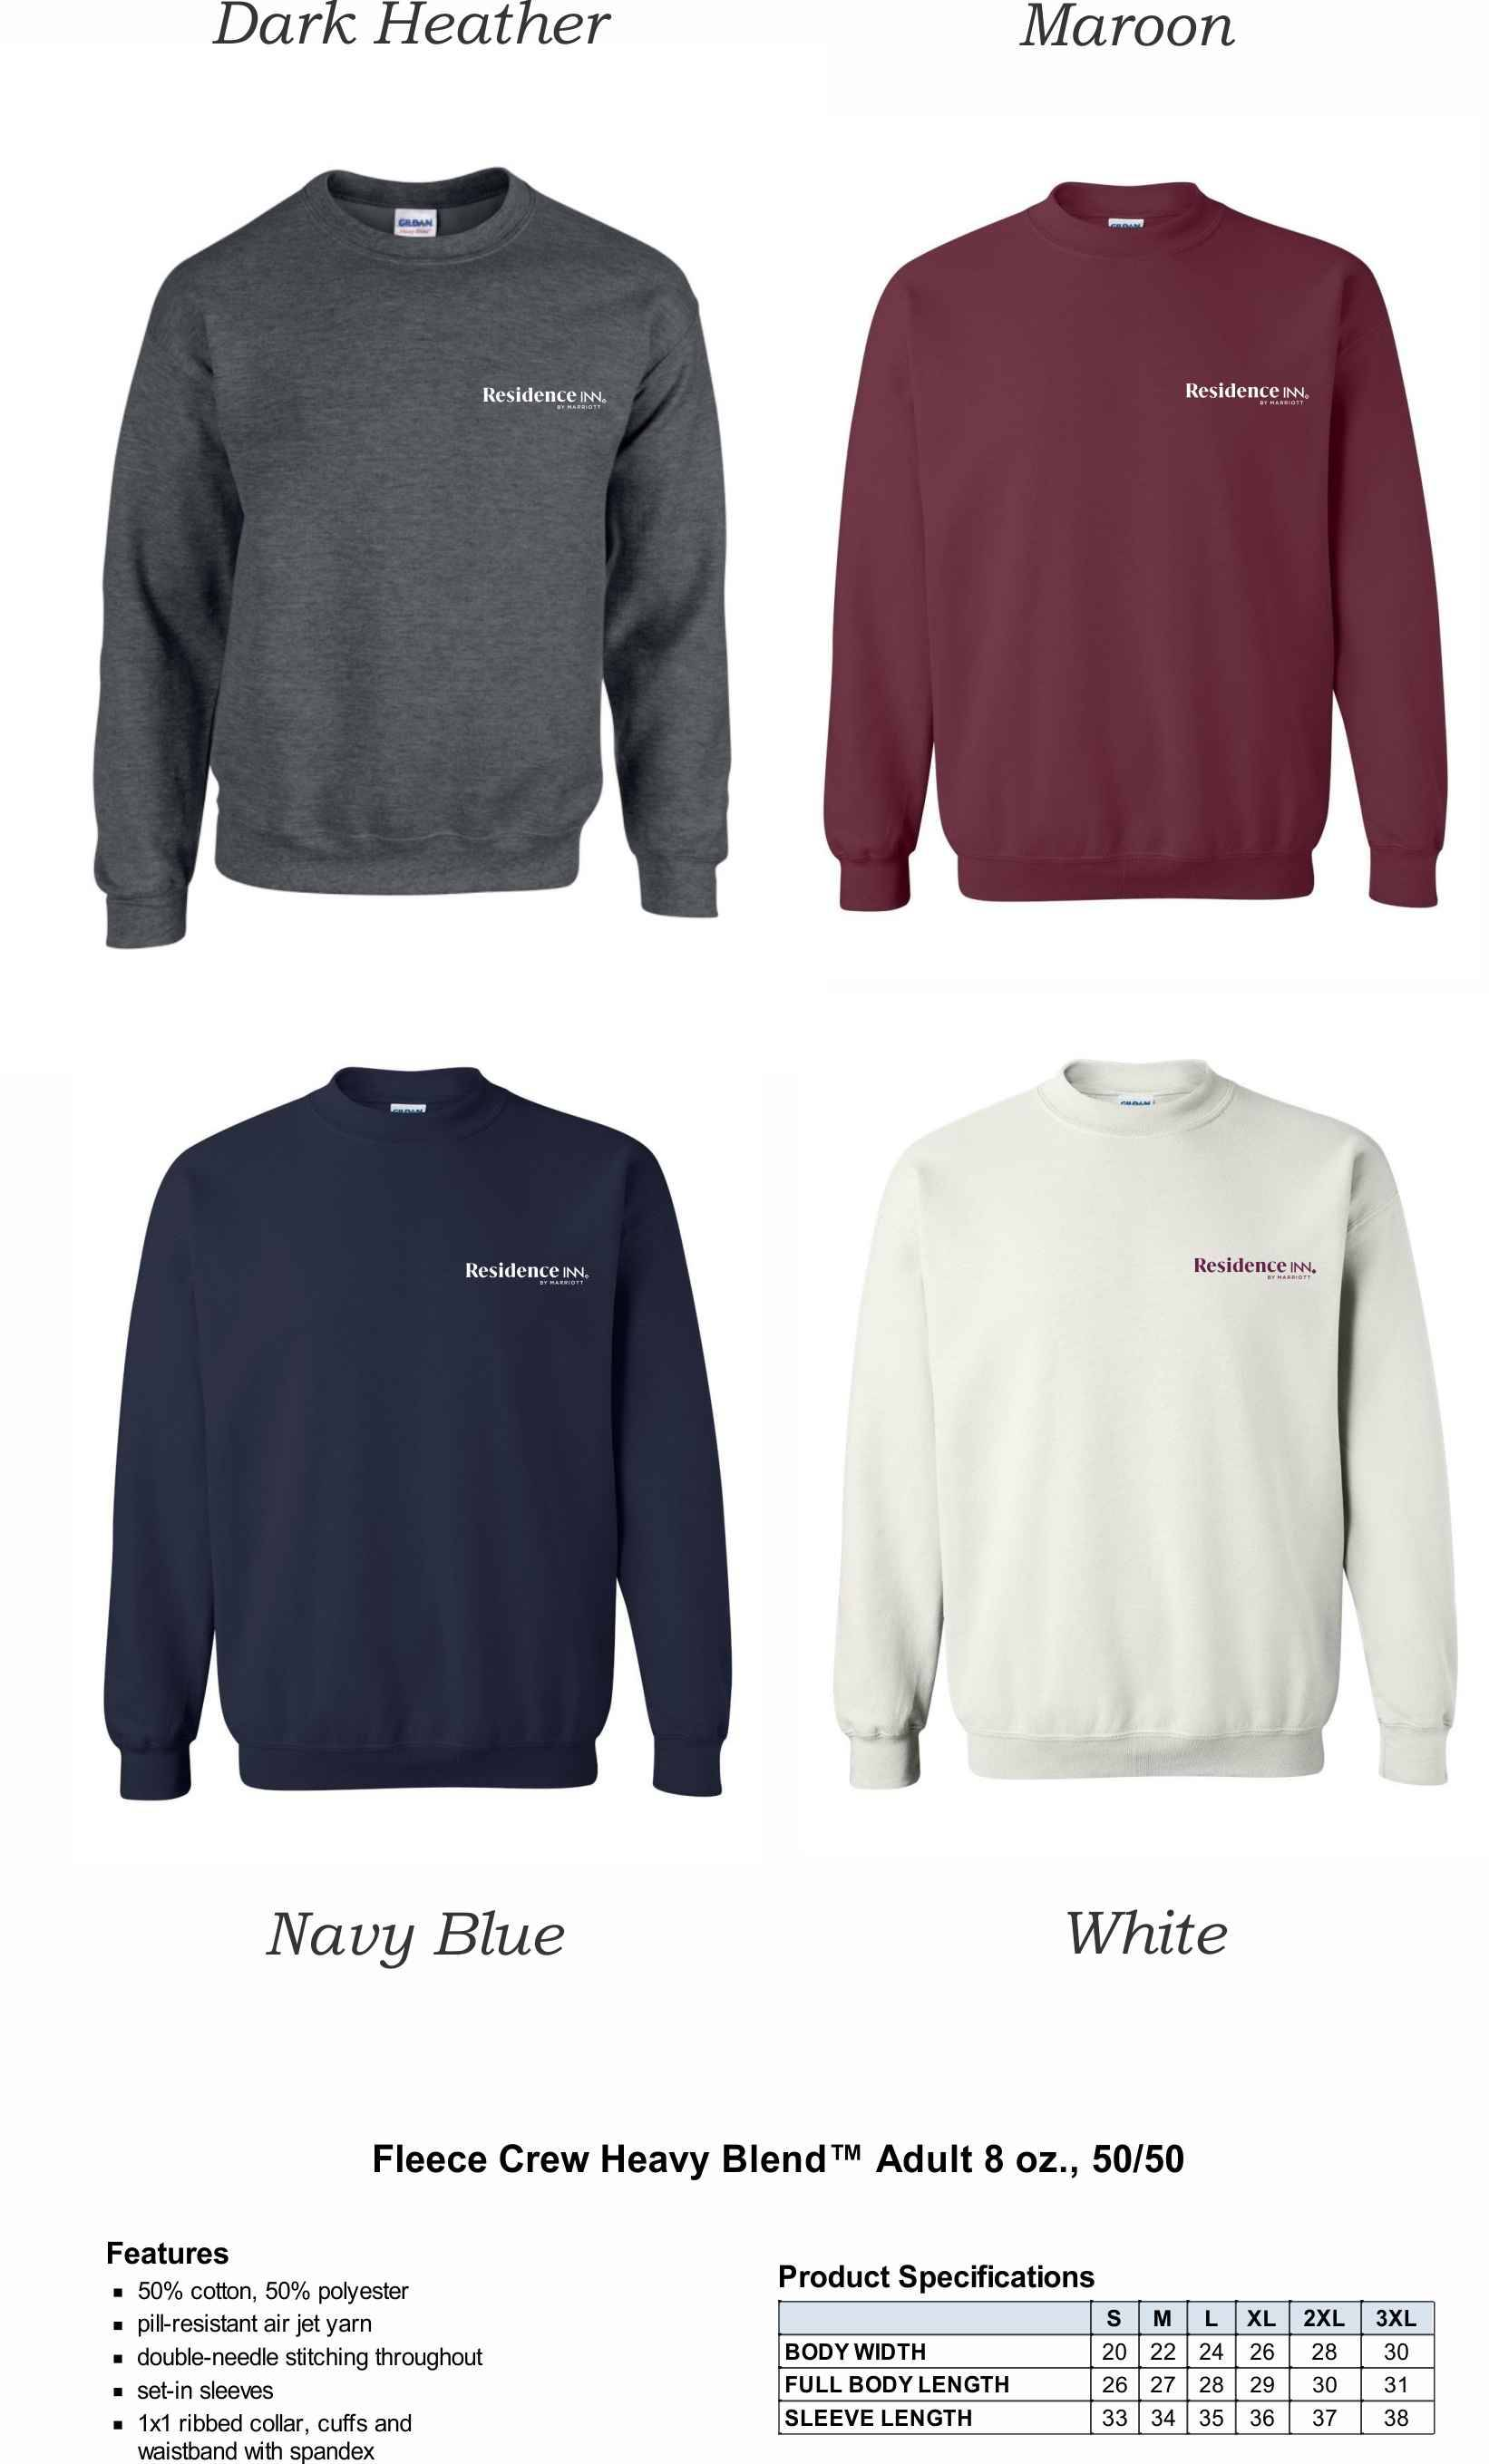 Sweatshirts, Crewneck. | 50/50 Heavy Blend | Silk-Screen Logo